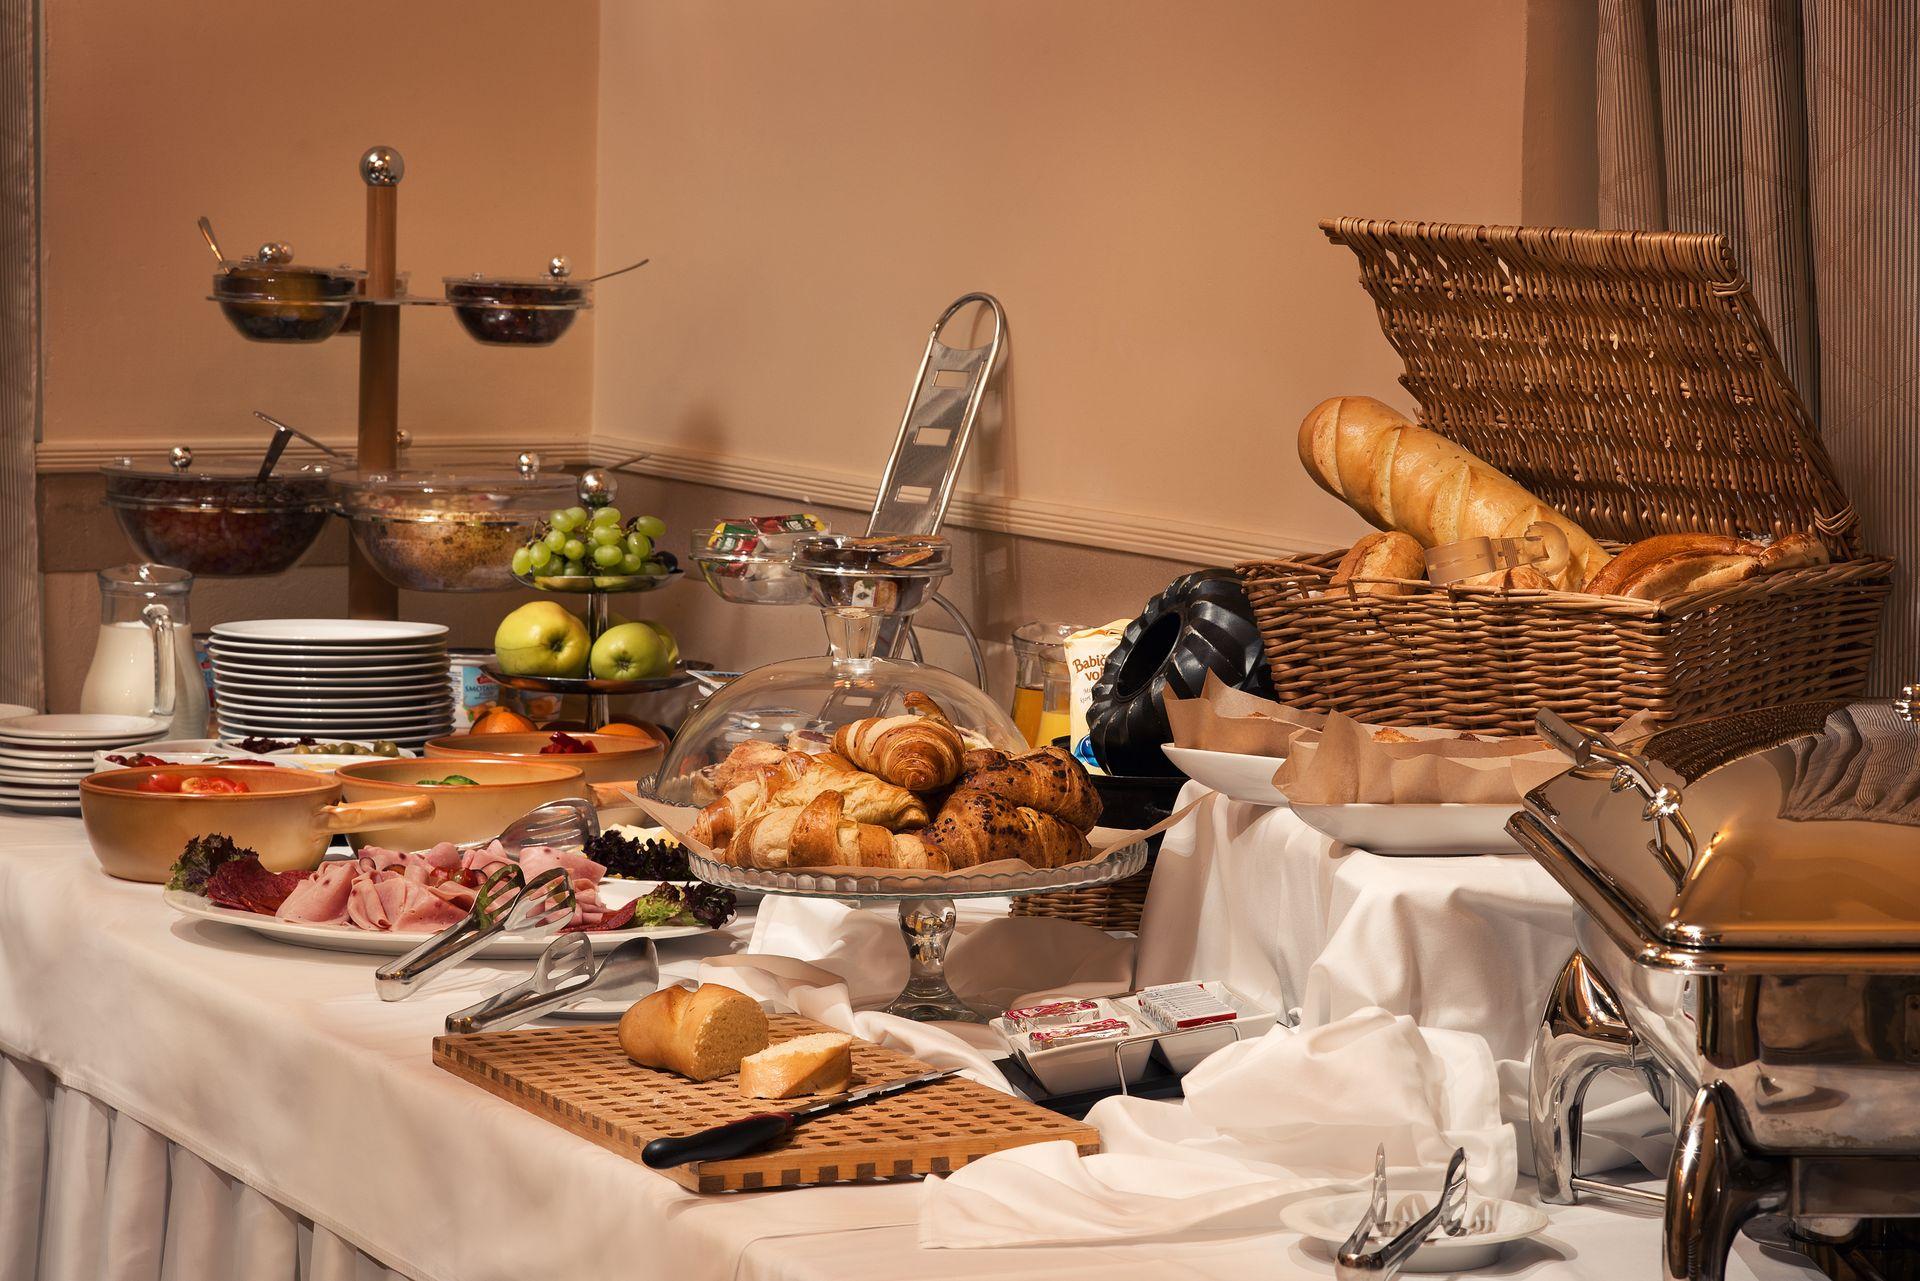 Hotel Ambassador Kosice restauracia ranajky